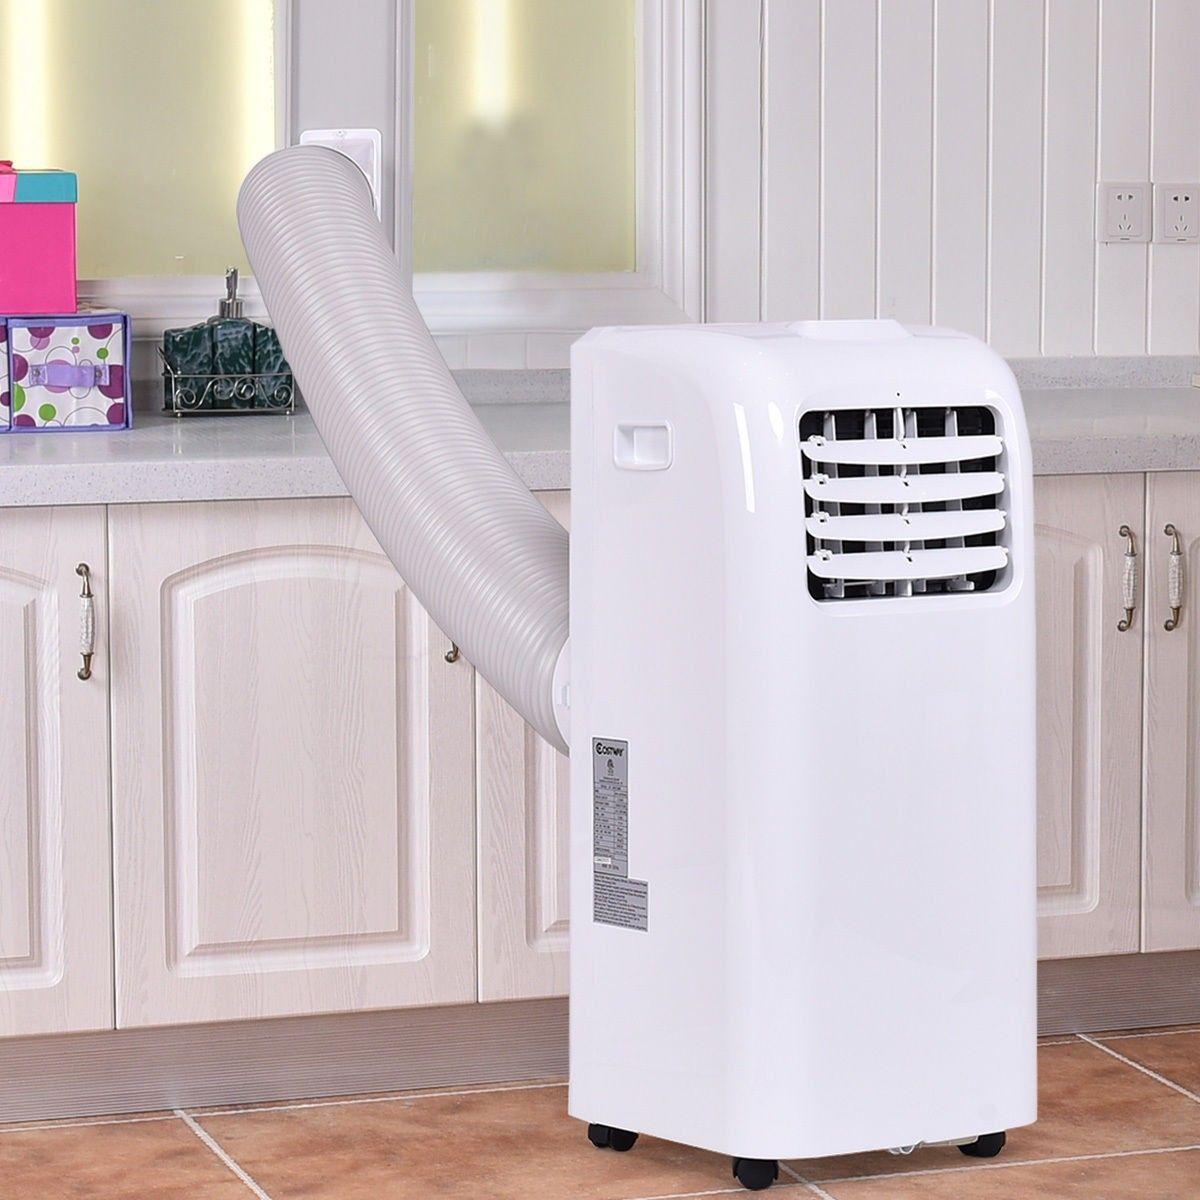 10000 Btu Portable Air Conditioner Dehumidifier Portable Air Conditioner Air Conditioner Dehumidifiers